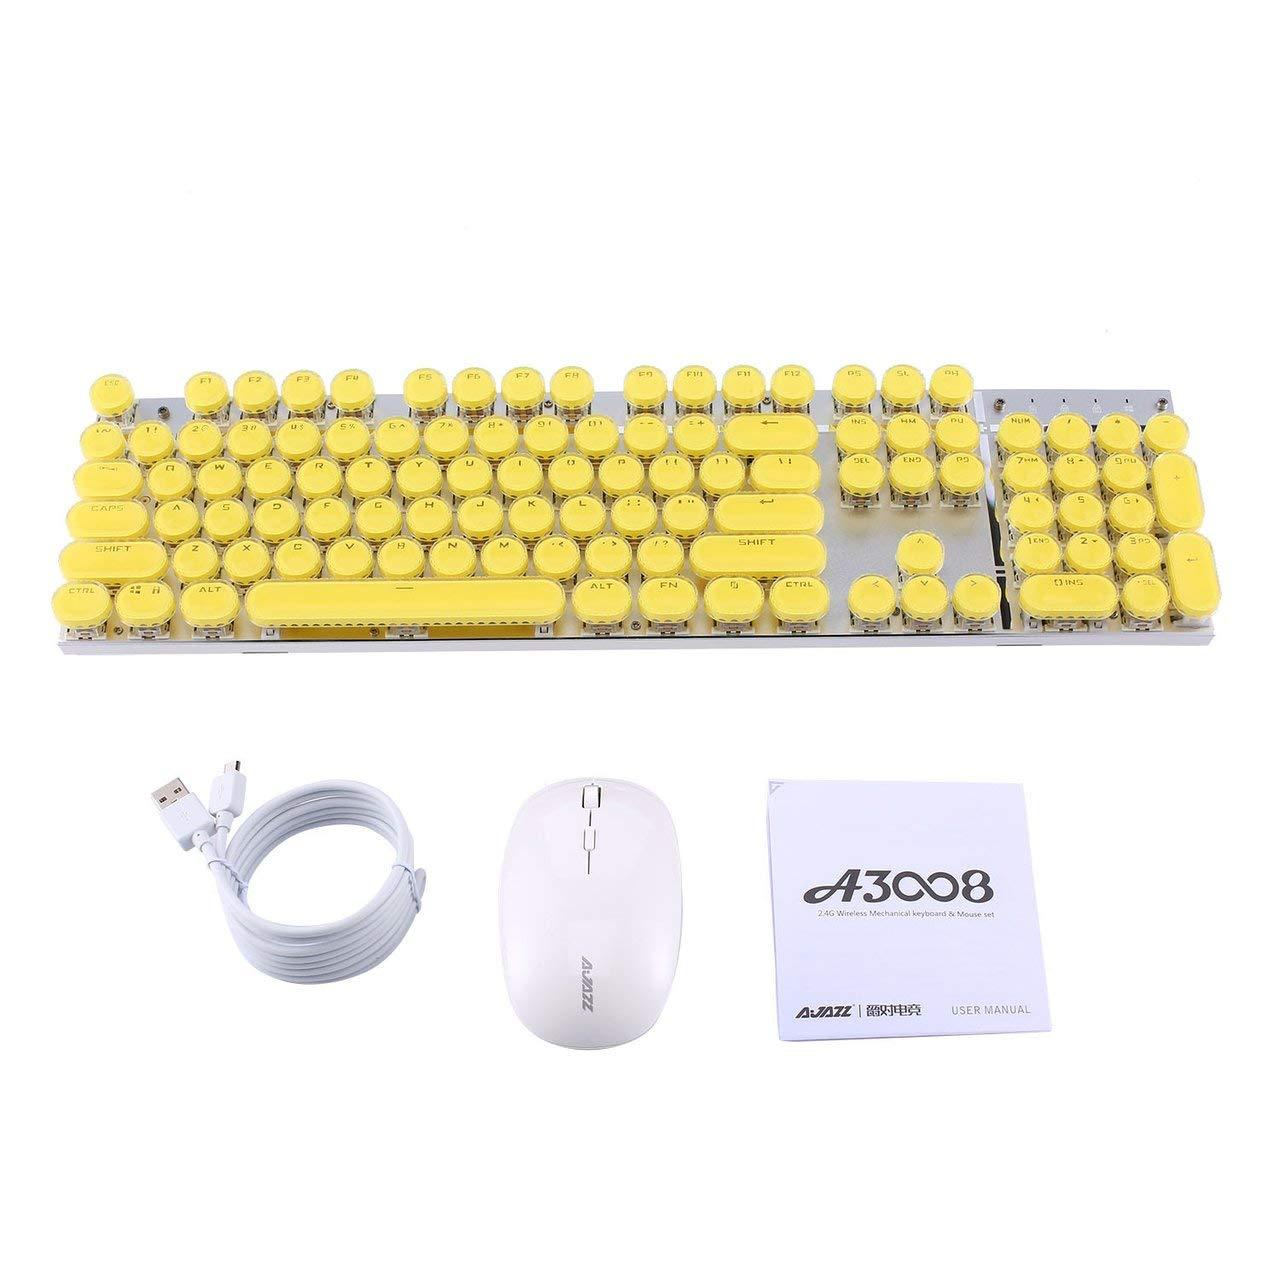 A3008 2.4G Wireless Mechanical Keyboard Gaming Keyboard Mouse Retro USB Typewriter Inspired Mechanical Keyboard by NeanTak-us